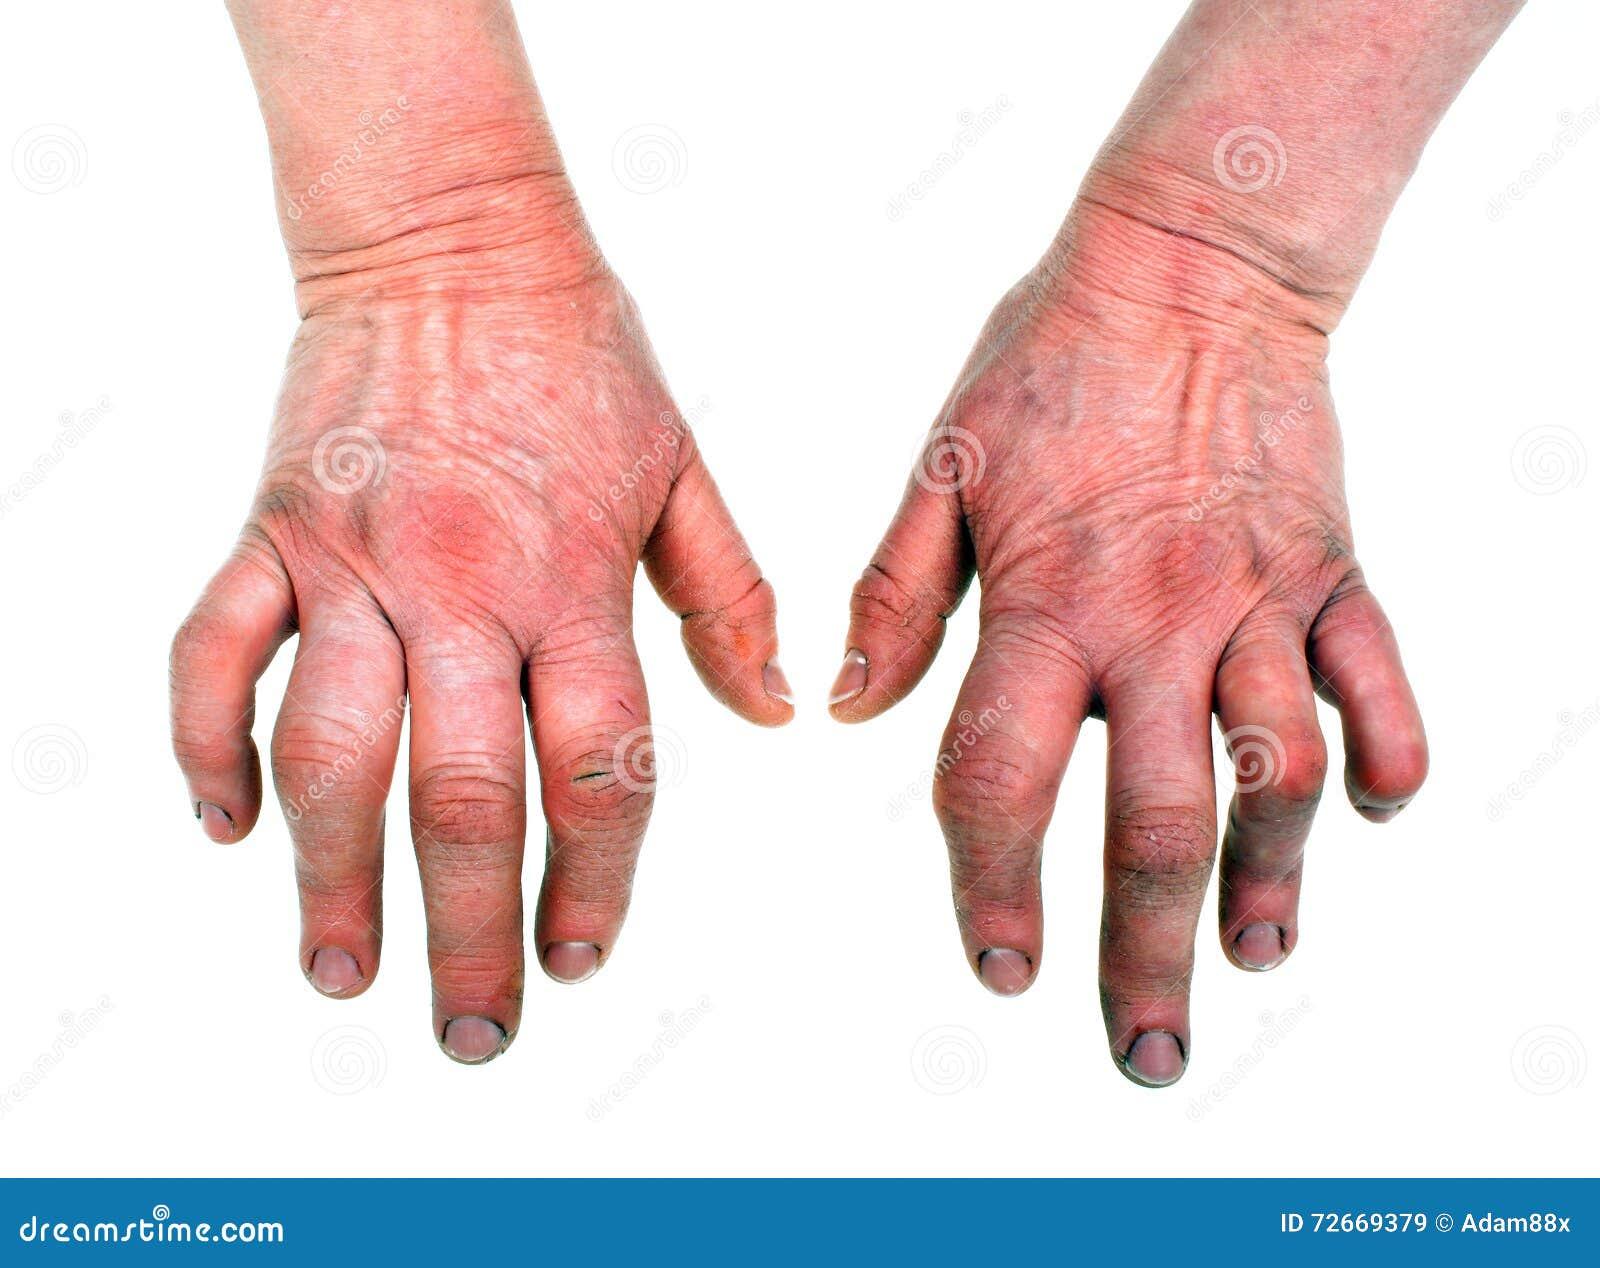 Artritis reumatoide imagen de archivo. Imagen de anatomía - 72669379